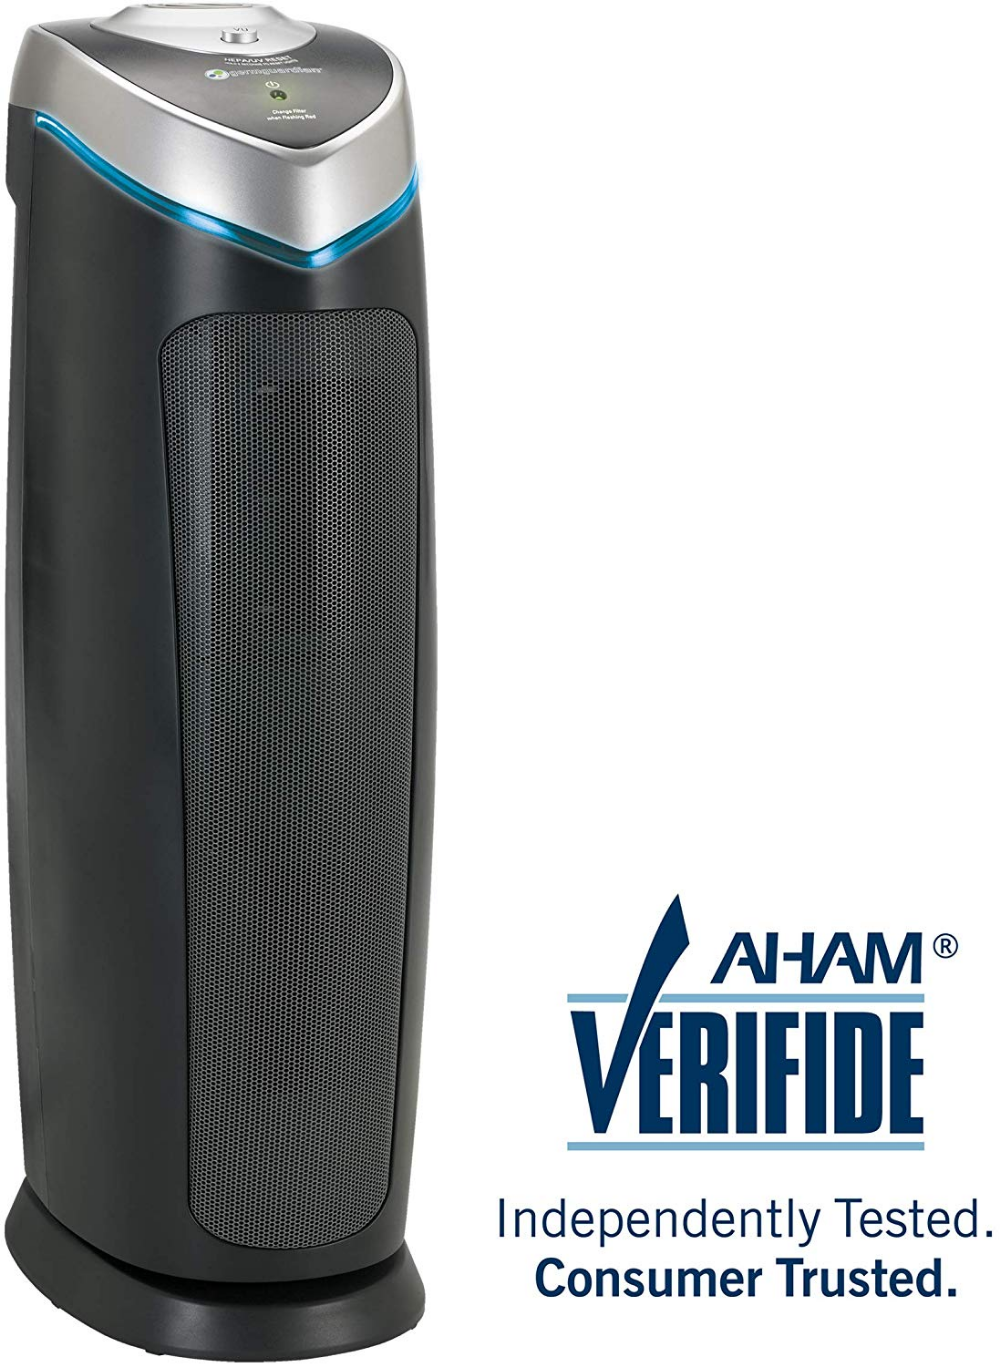 Top 10 Air Purifiers of 2020 Filter air purifier, Hepa